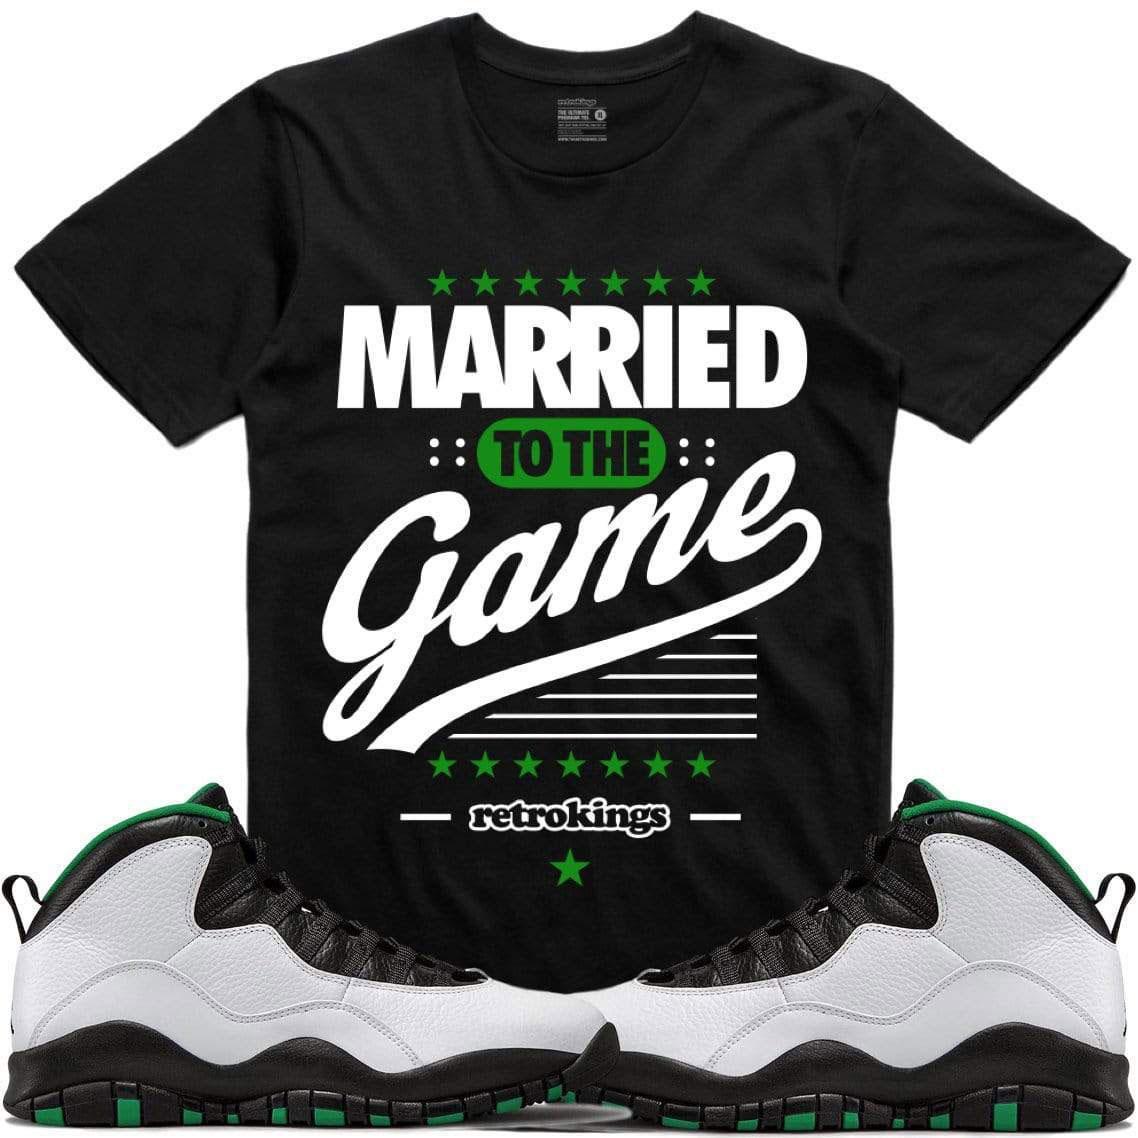 jordan-10-seattle-sneaker-shirts-retro-kings-5